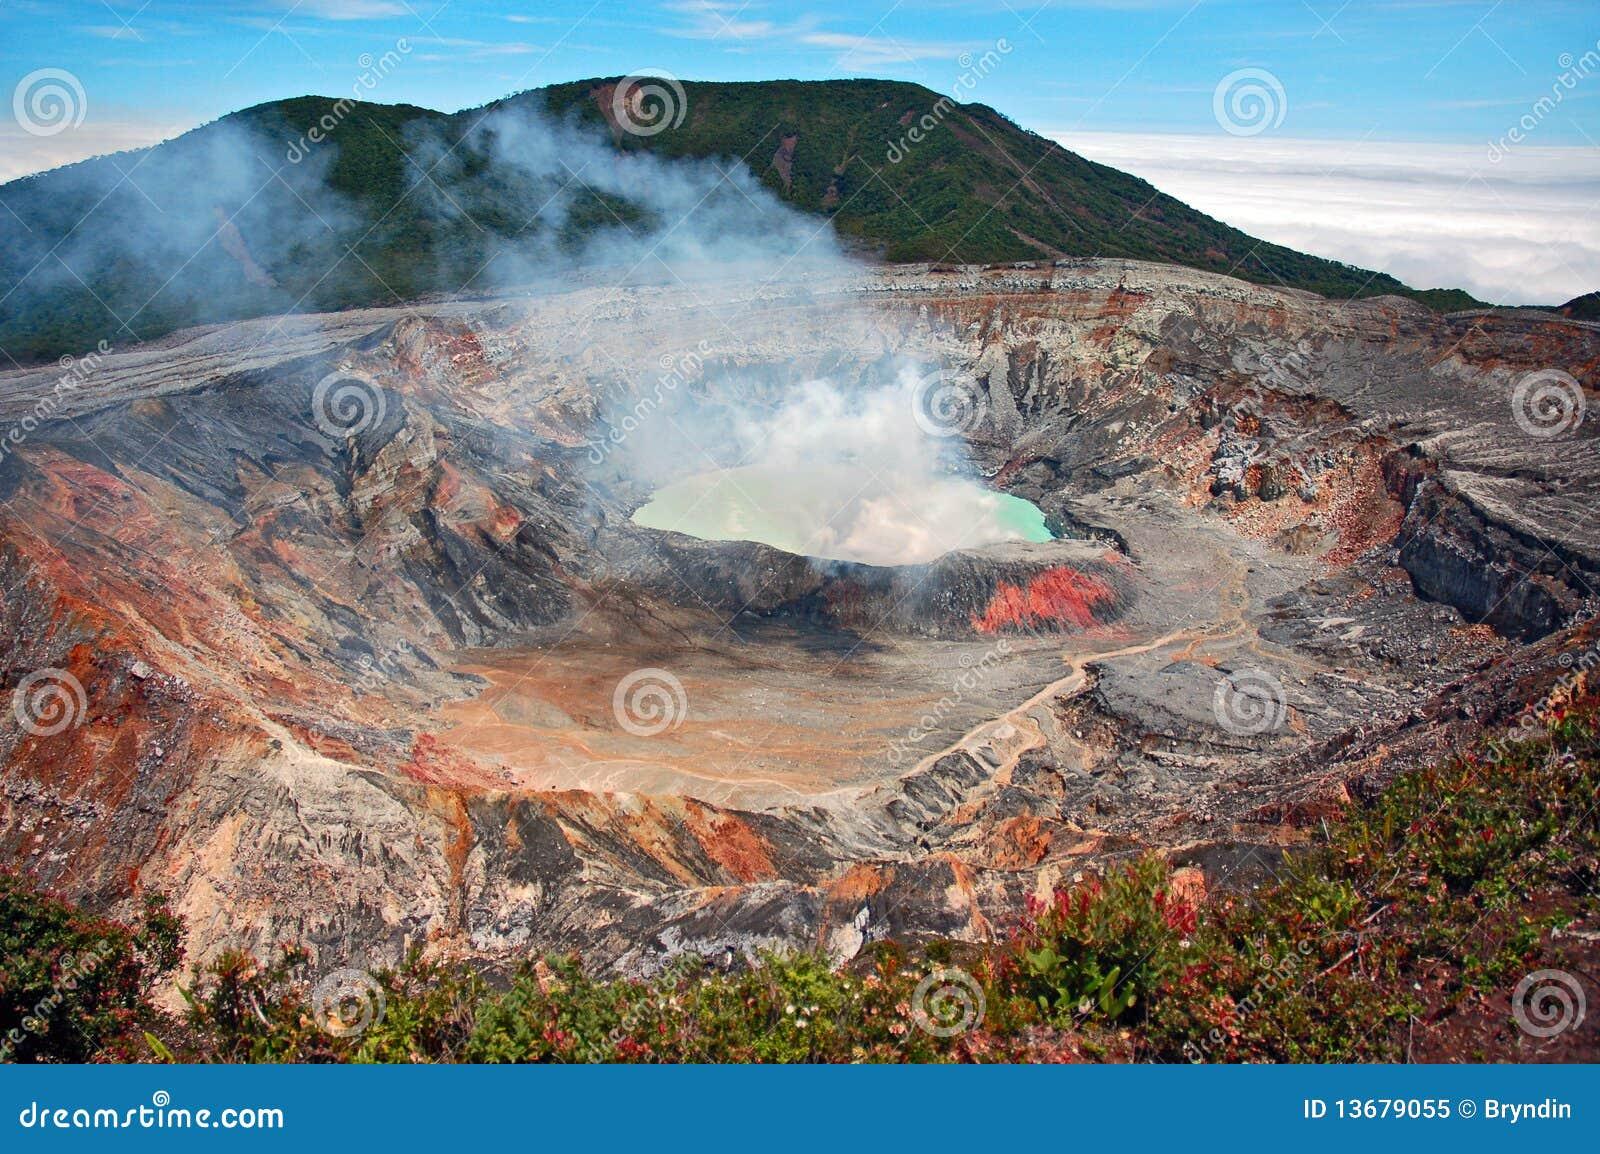 Volcano Royalty Free Stock Photo - Image: 13679055